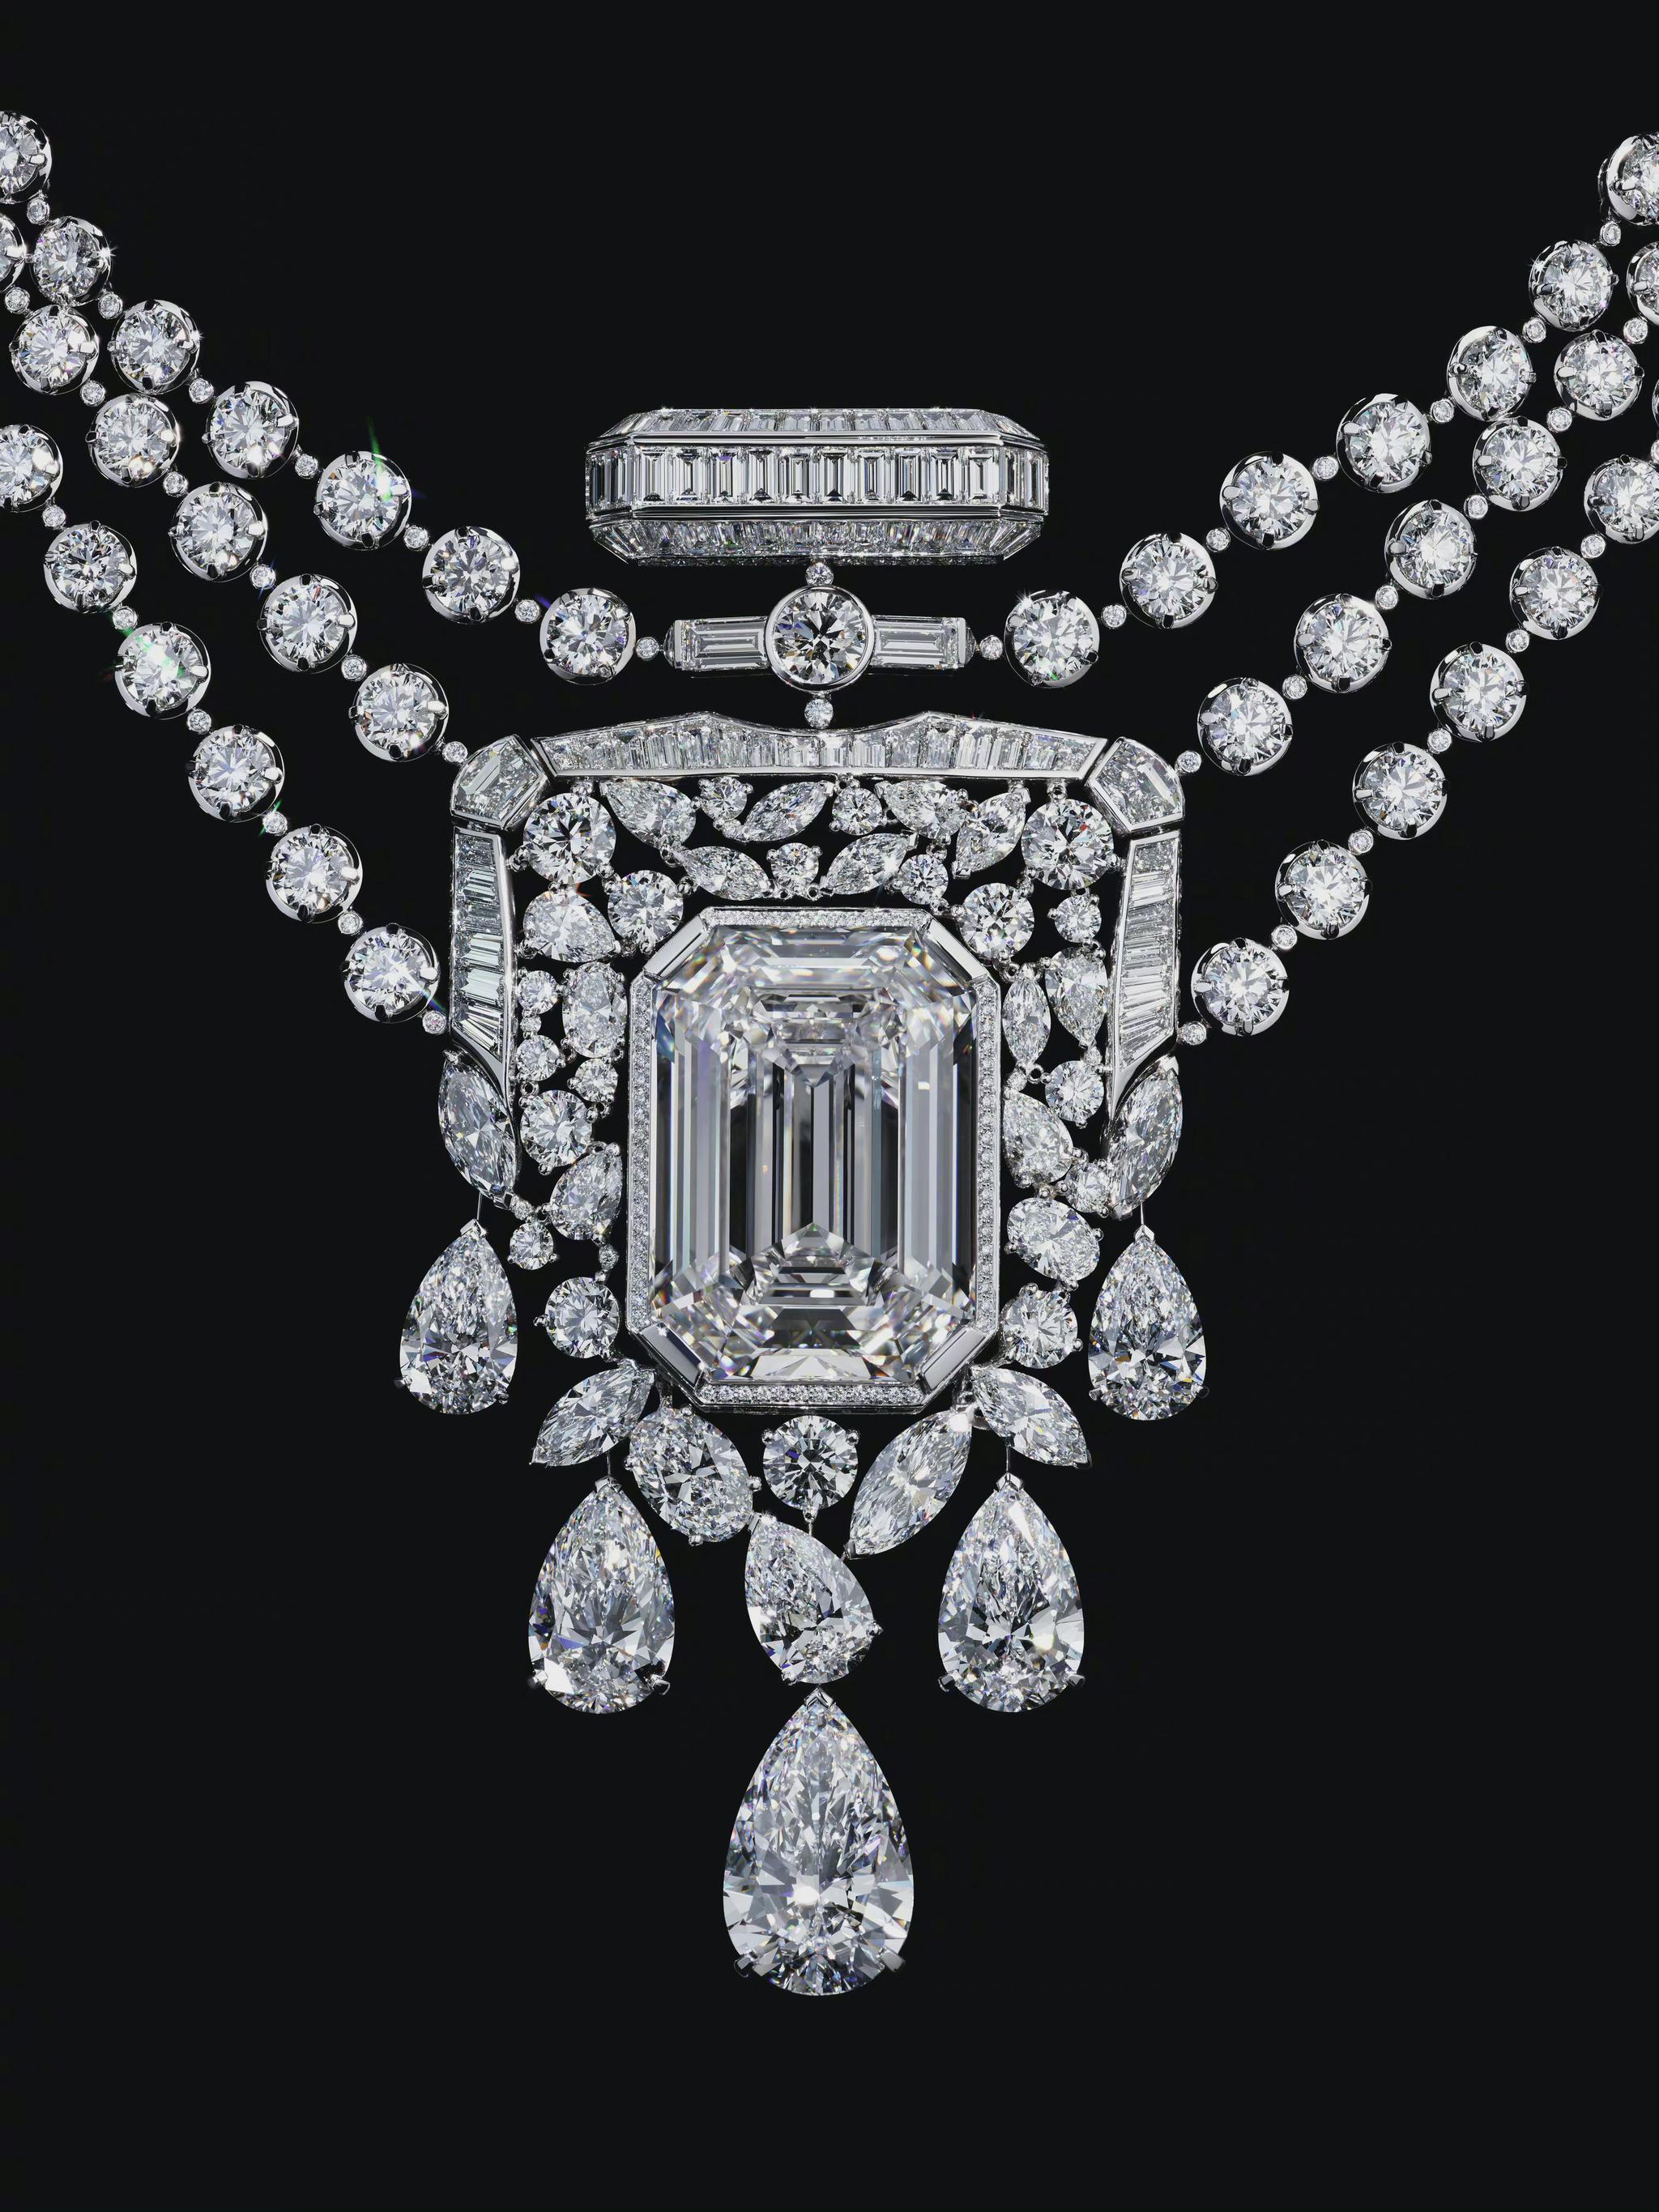 CHANEL 臻品珠宝N°5系列55.55项链 ……